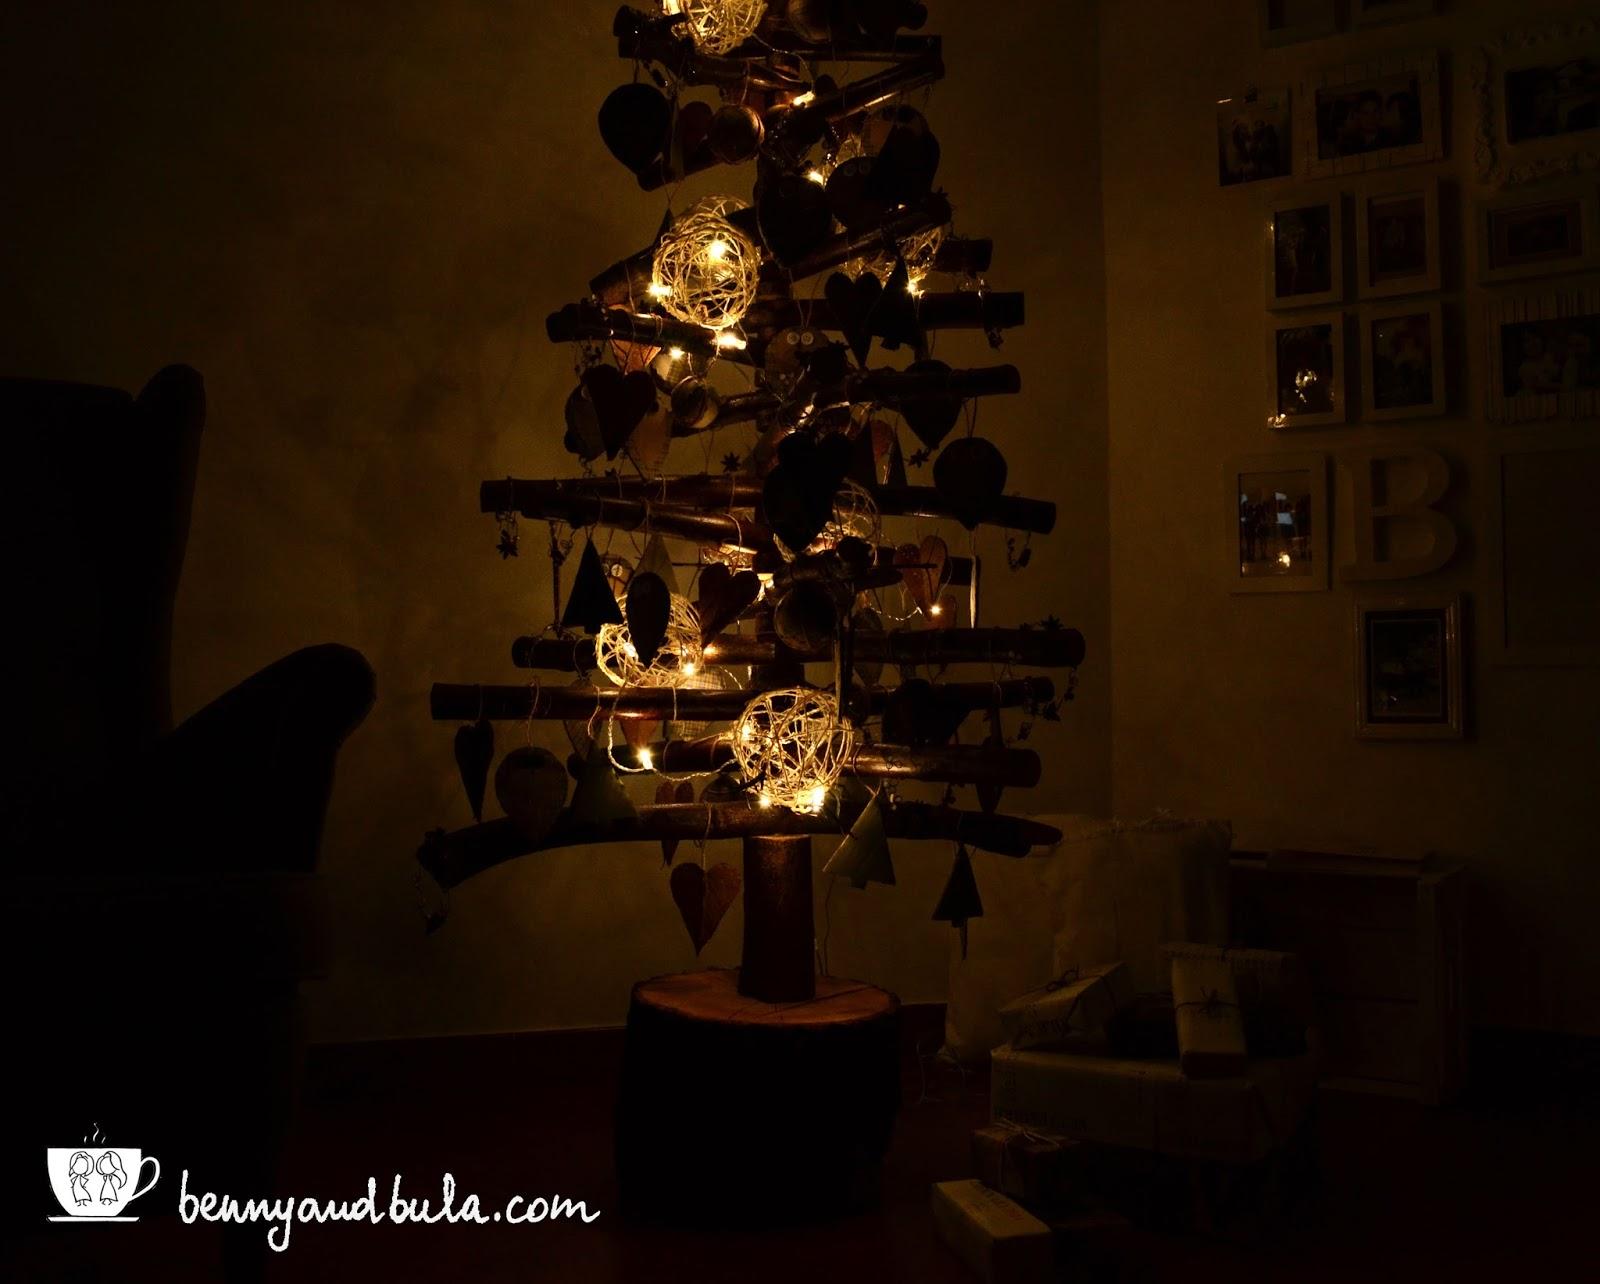 Albero di Natale, luci di sera/DIY Christmas Tree by night